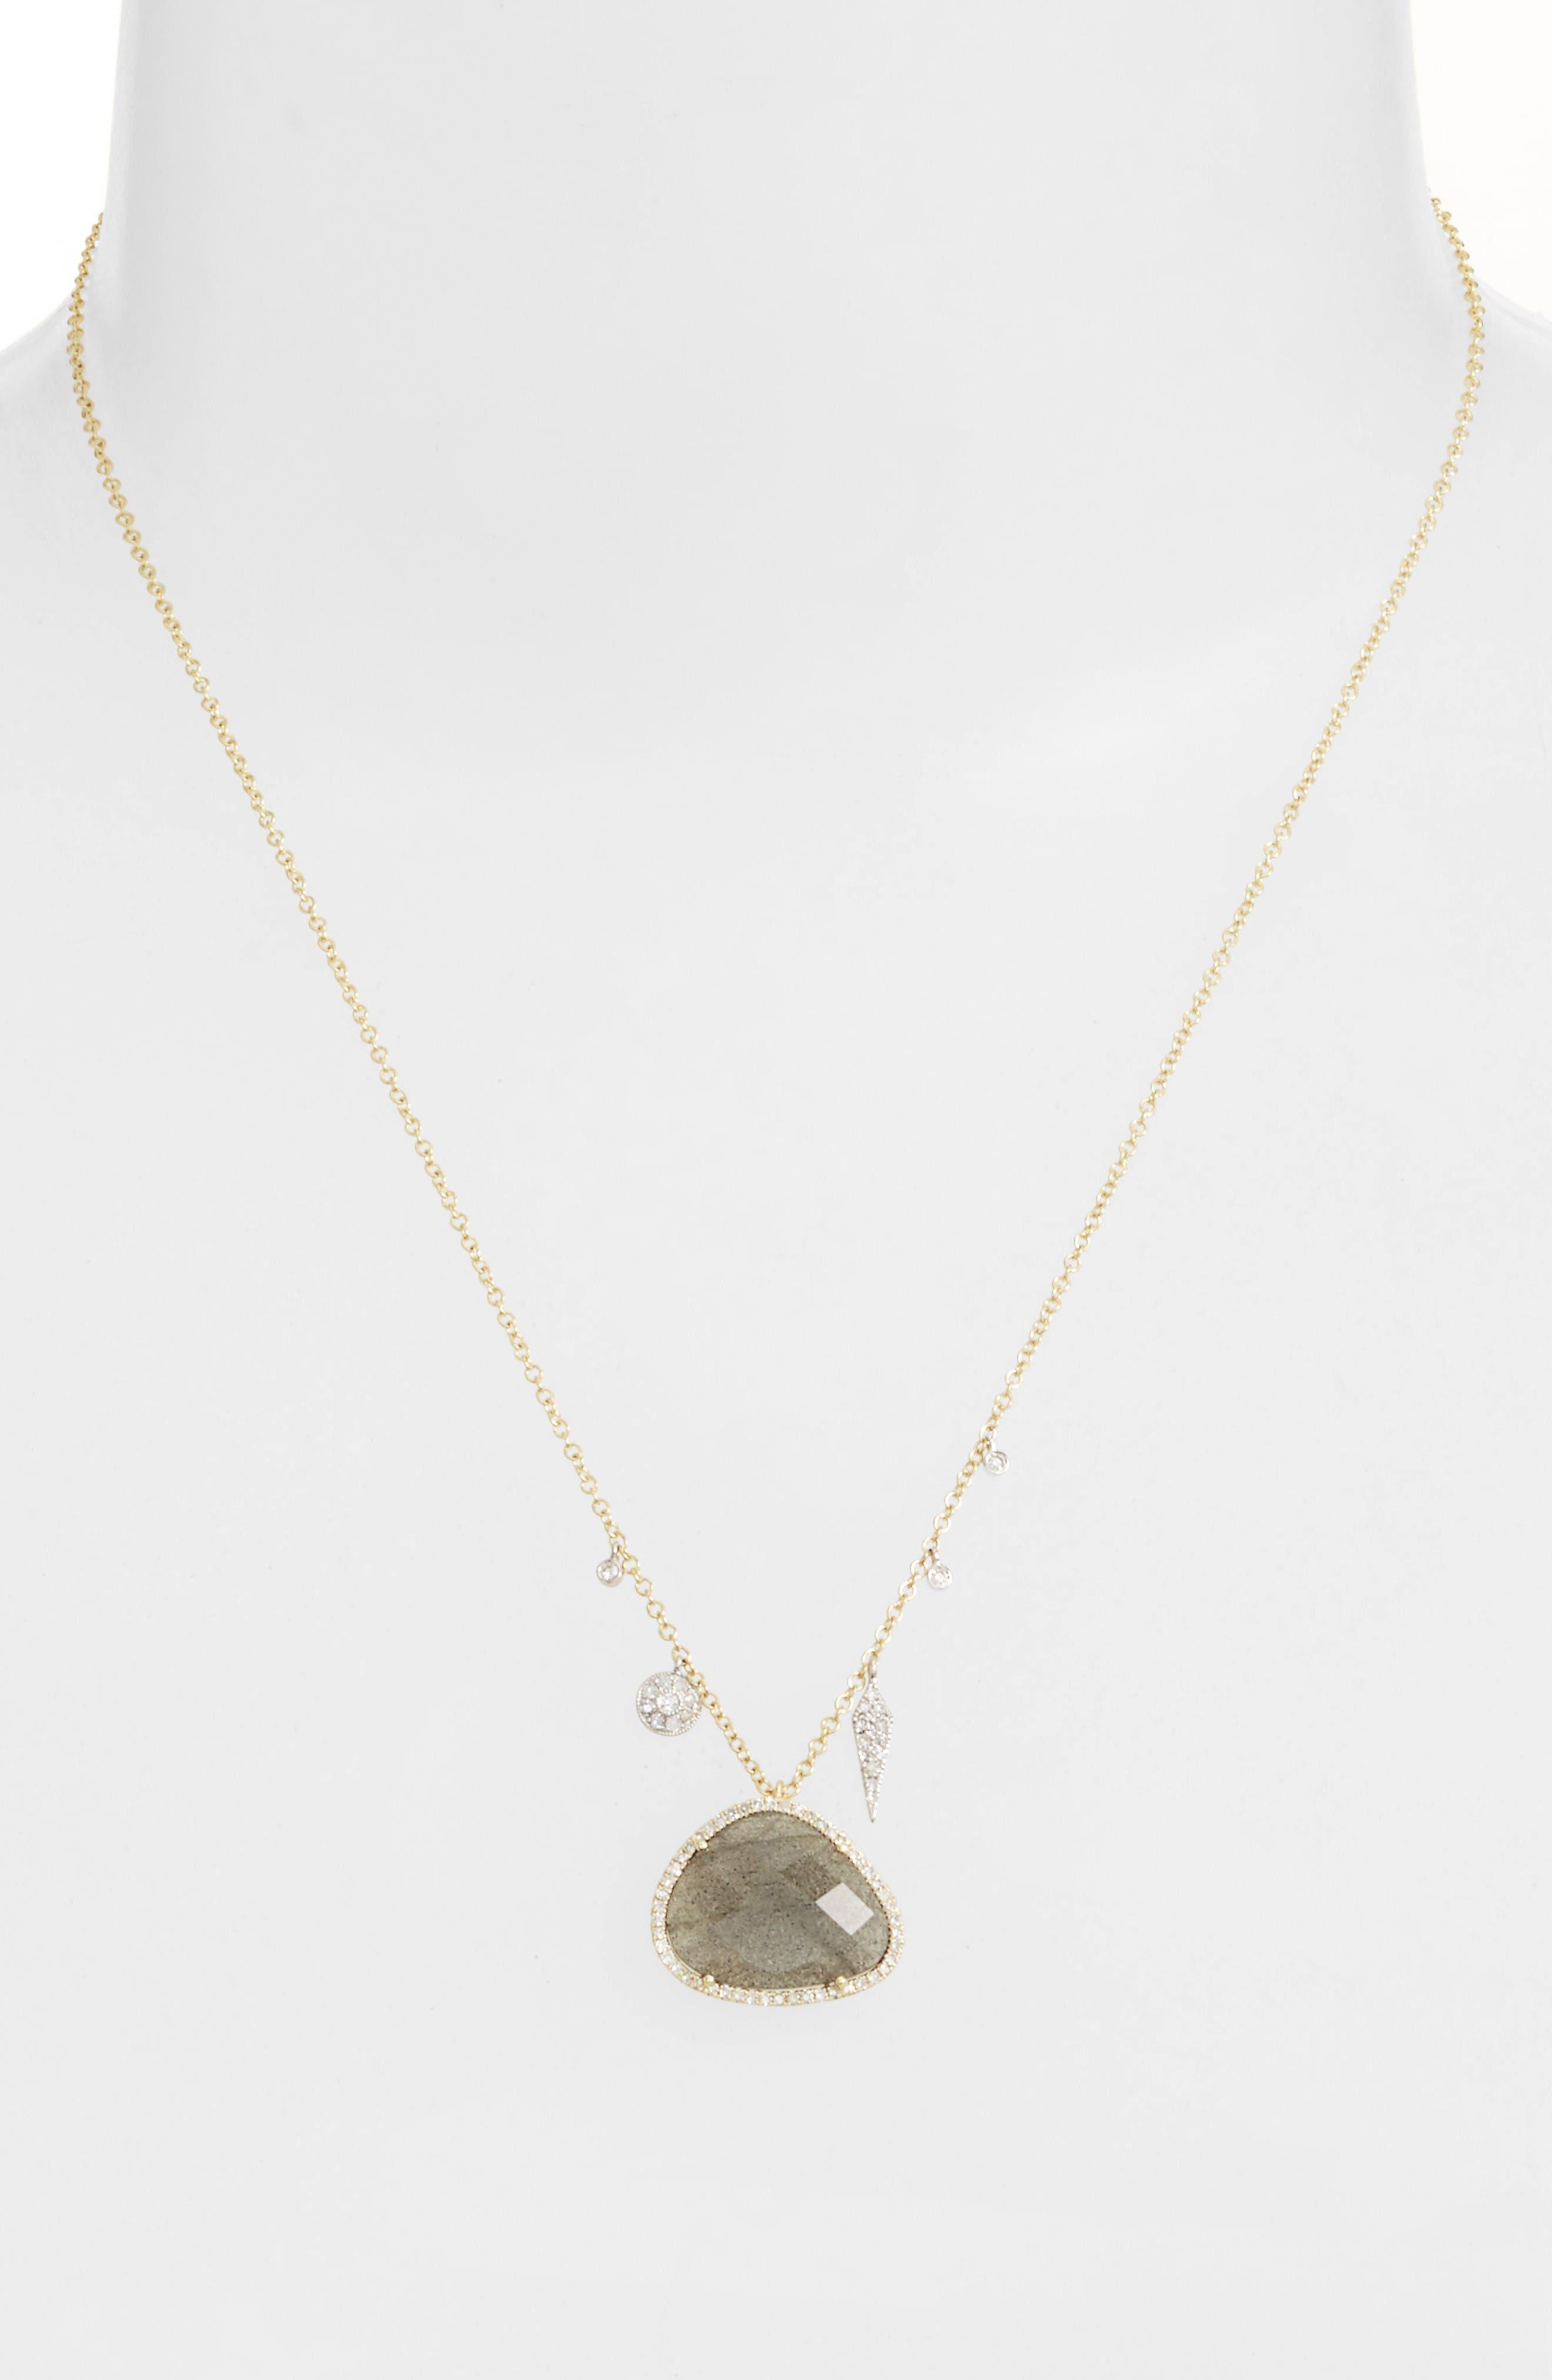 Jewelry Diamond & Semiprecious Stone Pendant Necklace,                             Alternate thumbnail 2, color,                             Yellow Gold/ Labradorite